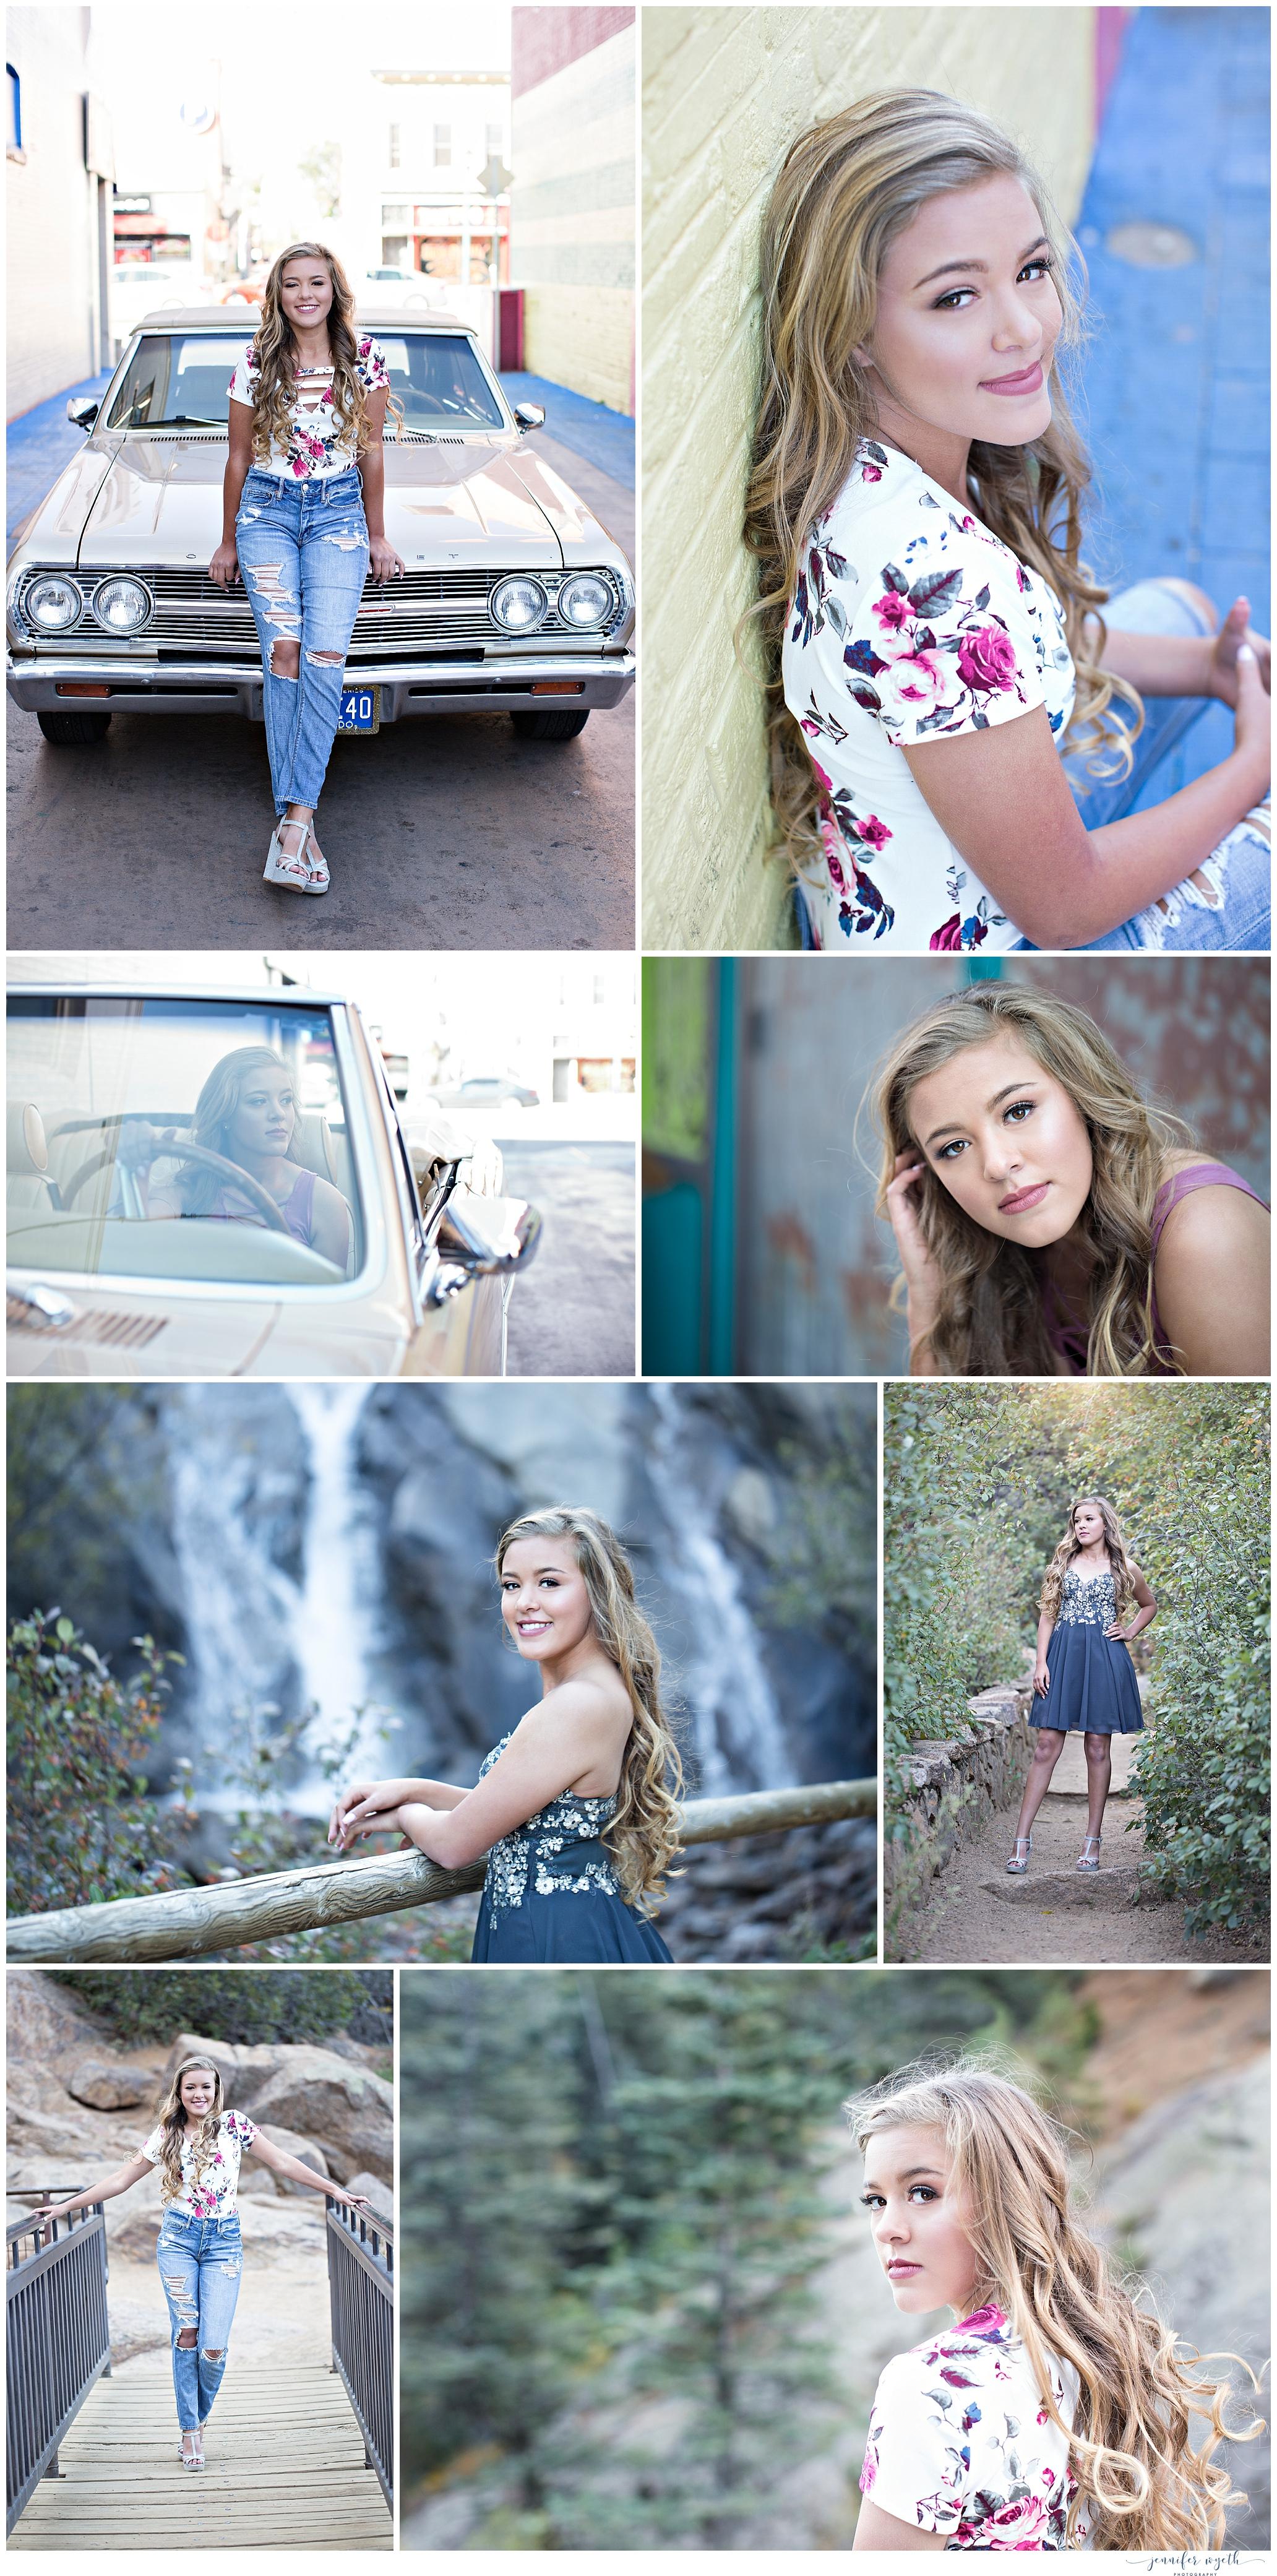 Jennifer-Wyeth-photography-senior-pictures-colorado-springs-photographer_0241.jpg